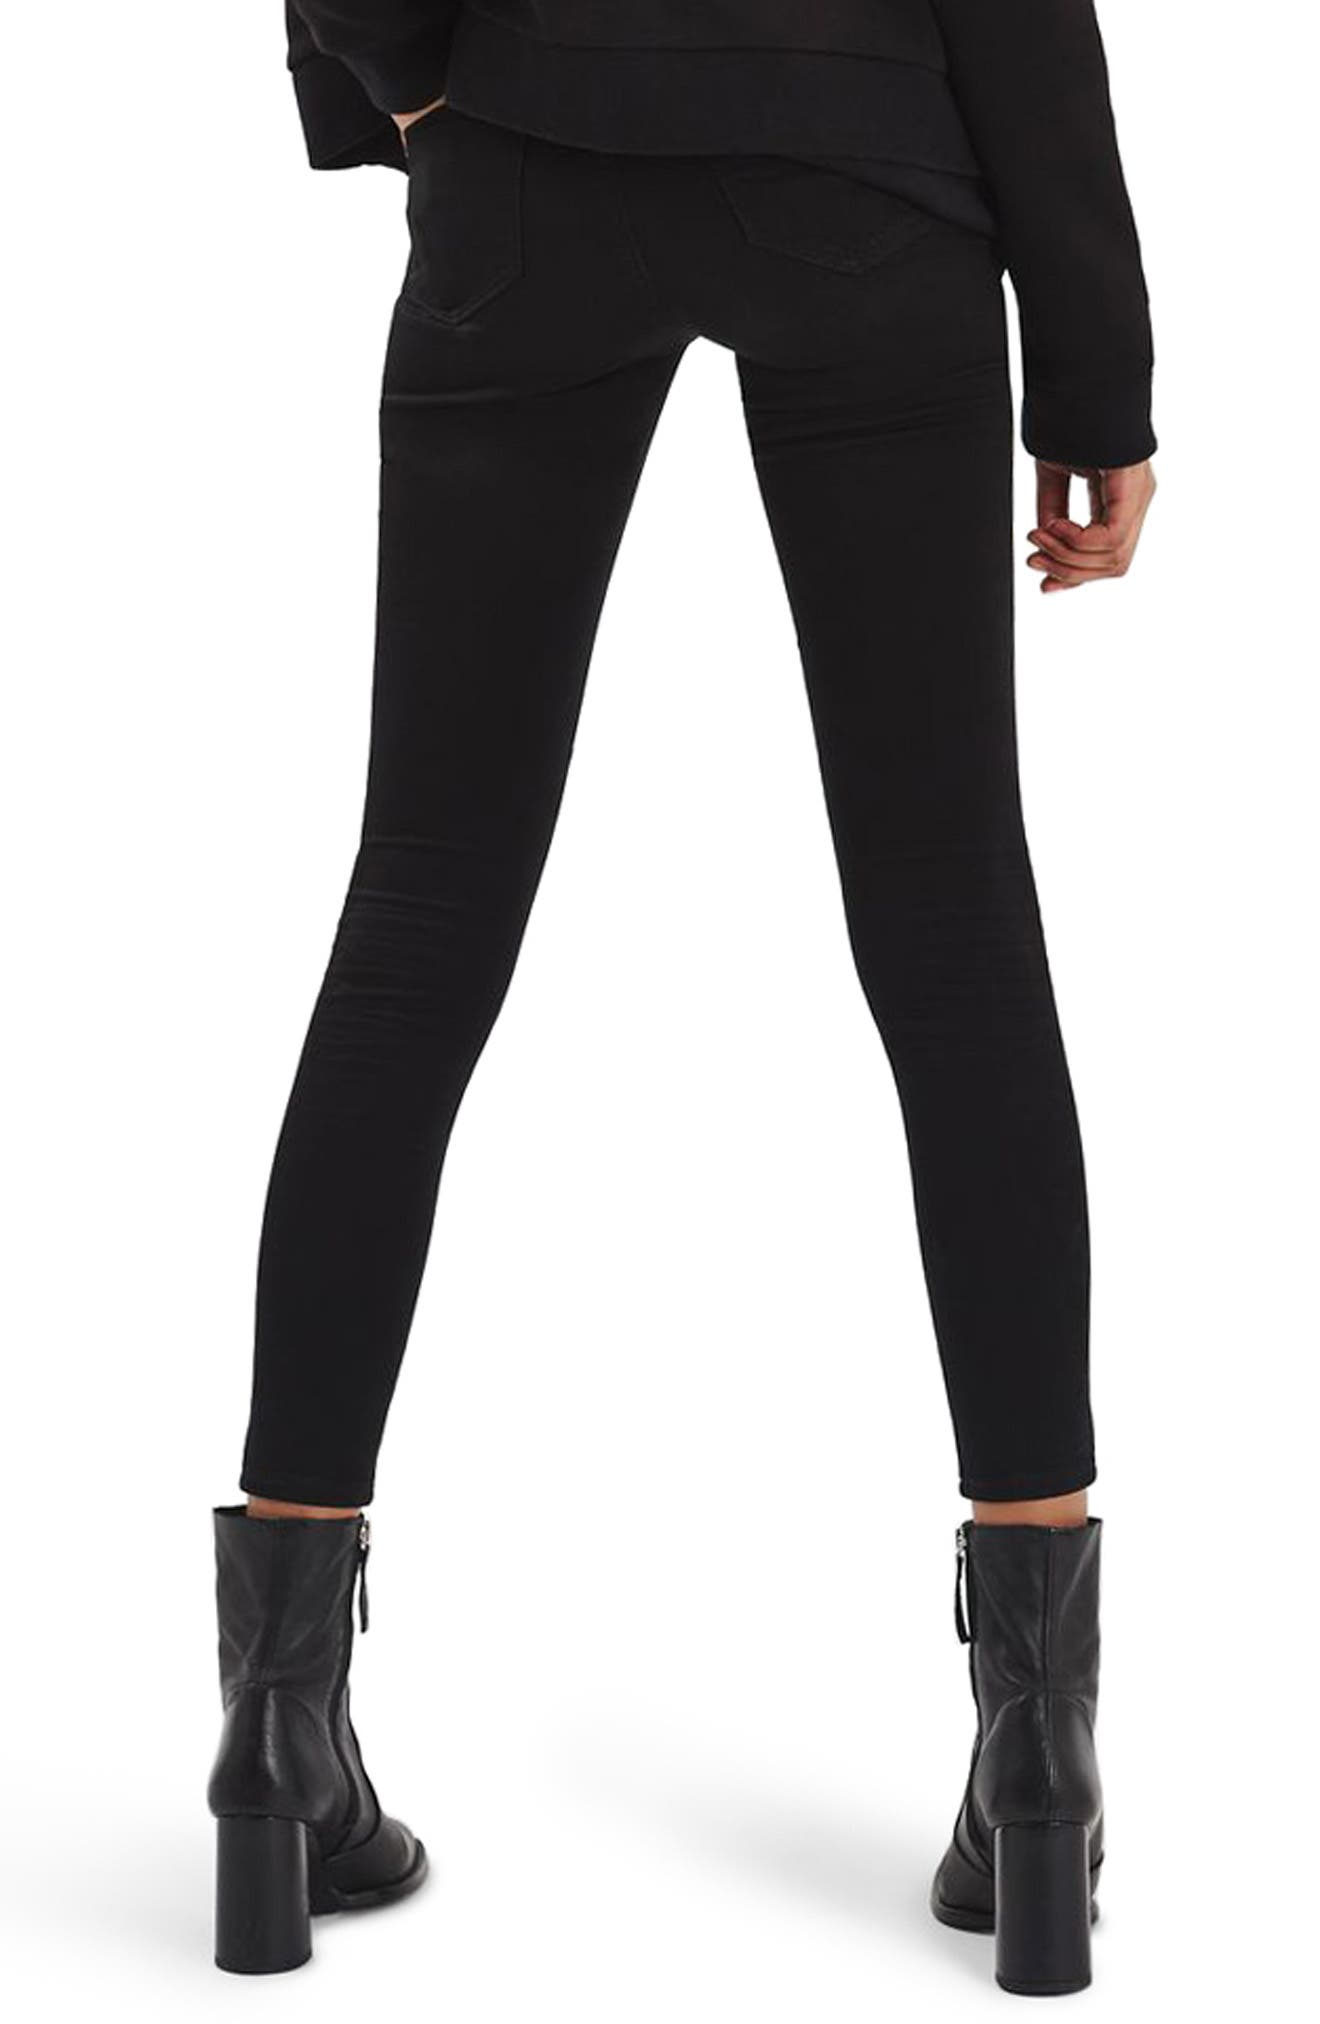 Leigh Super Rip Skinny Jeans,                             Alternate thumbnail 2, color,                             Black